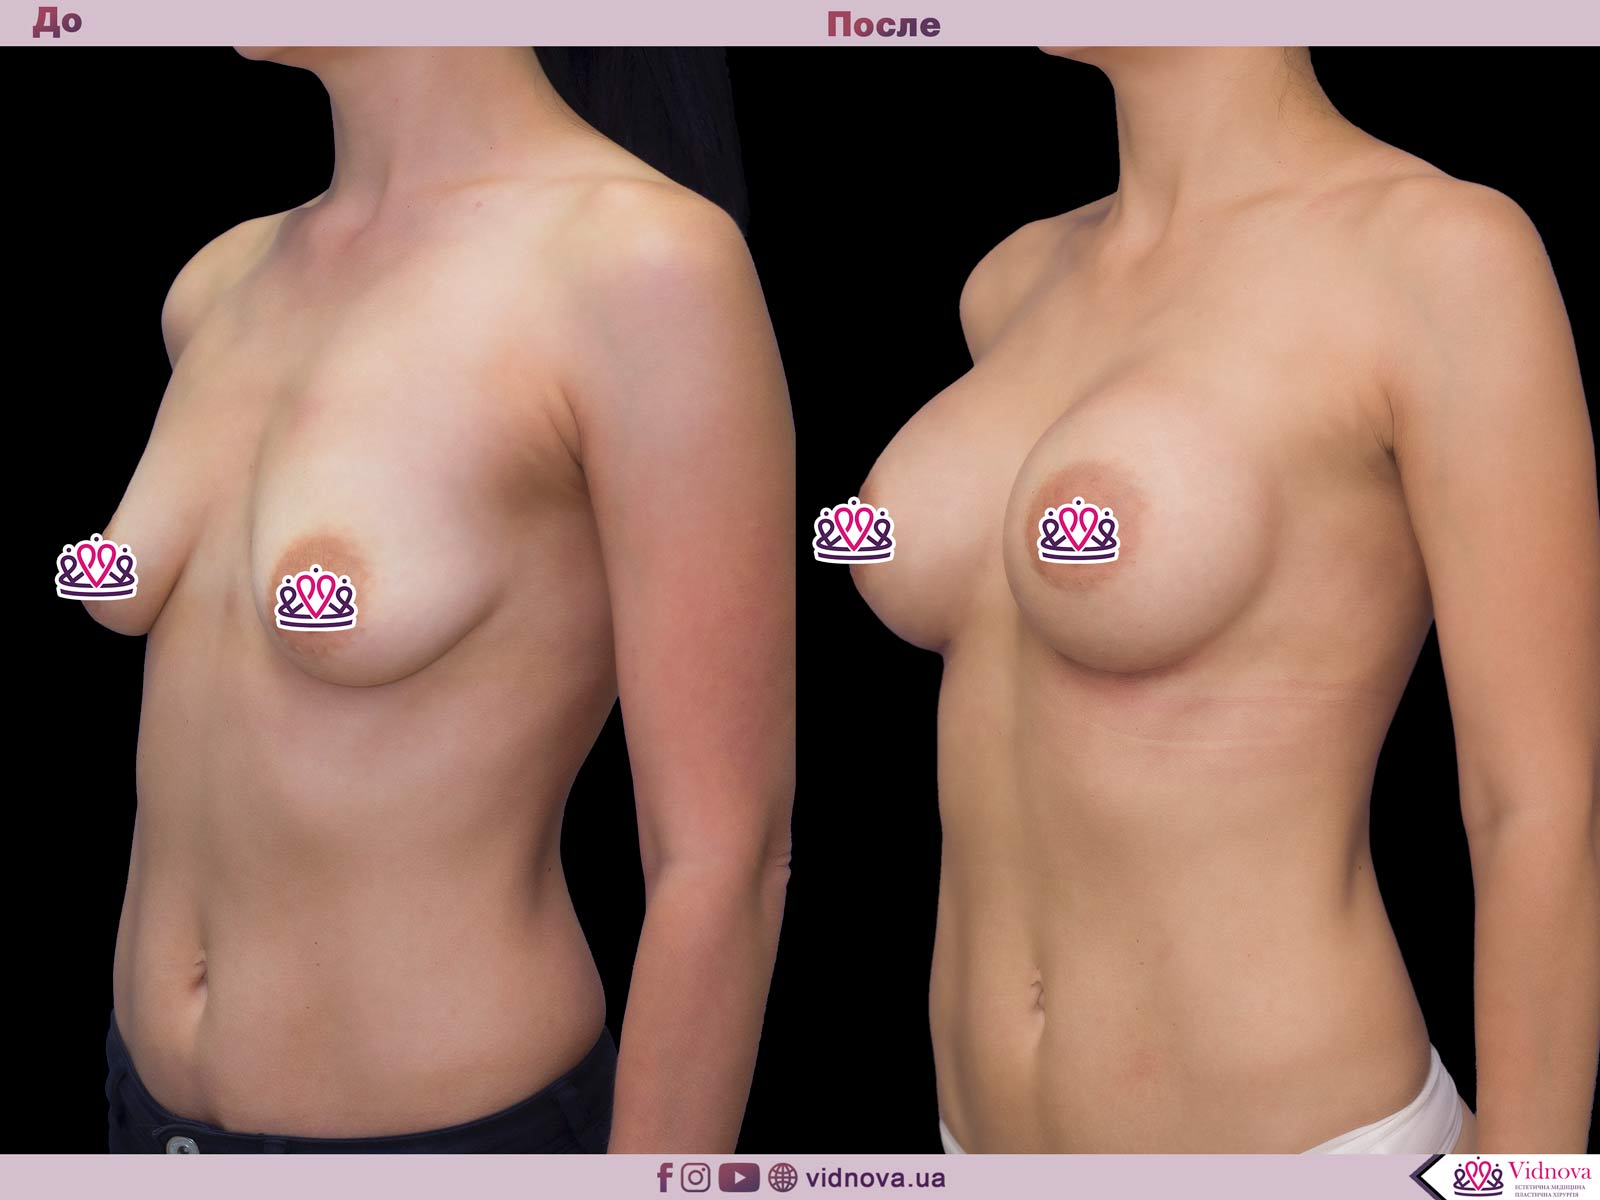 Увеличение груди: Фото ДО и ПОСЛЕ - Пример №47-2 - Клиника Vidnova